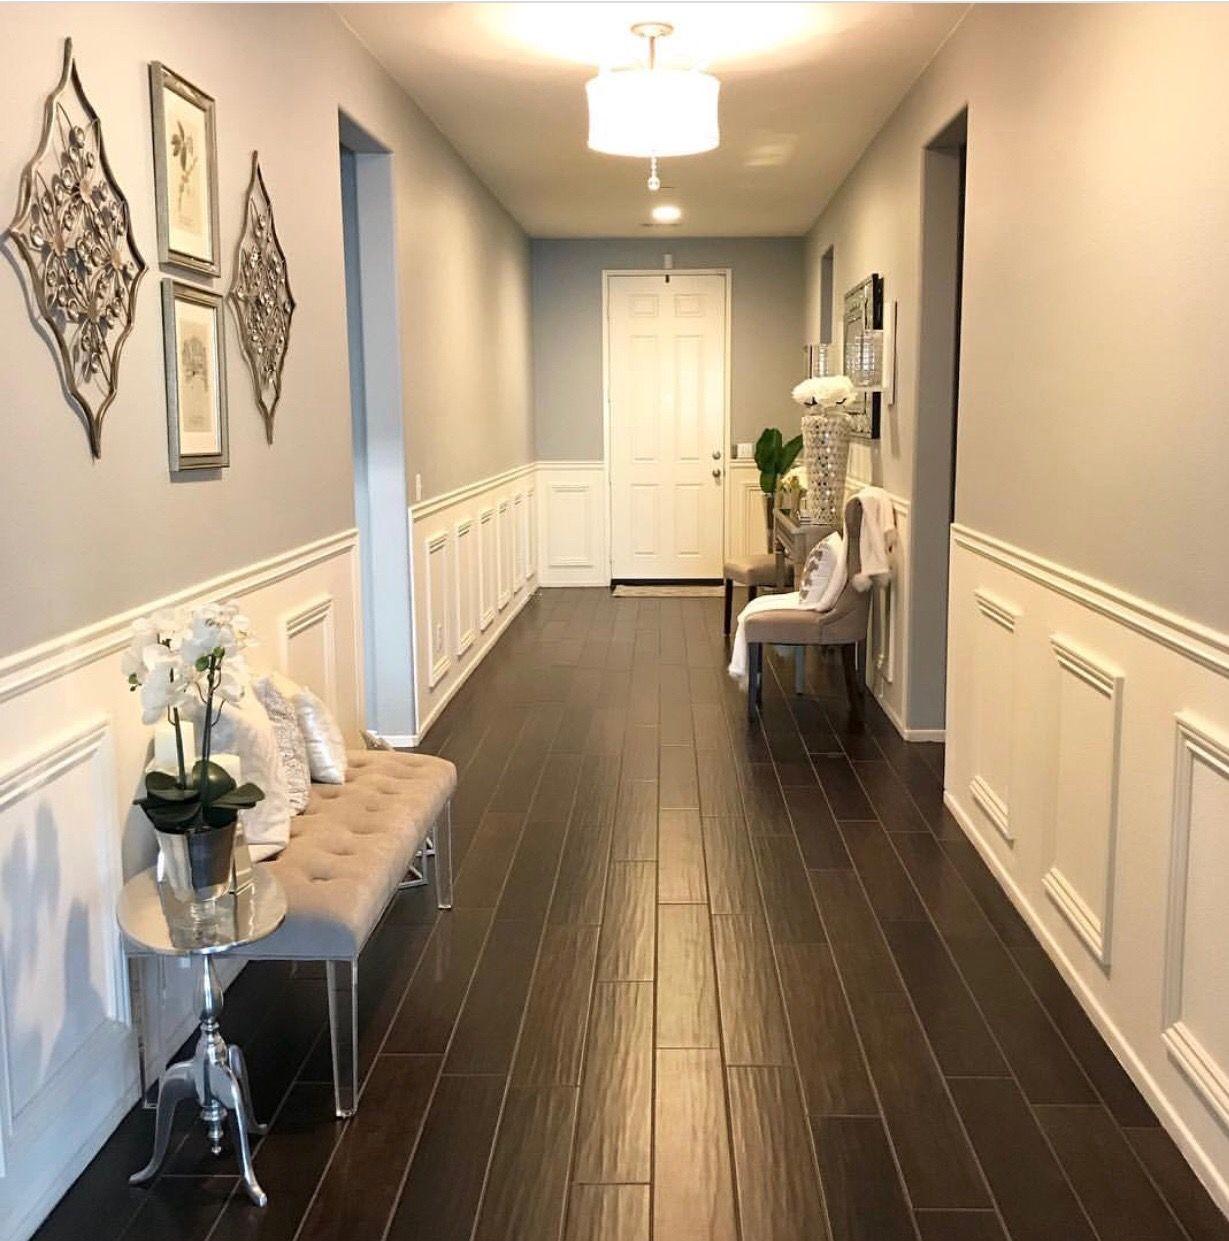 Exteriorhouse Wall Design: Floor Design , Hall Decor, Cozy